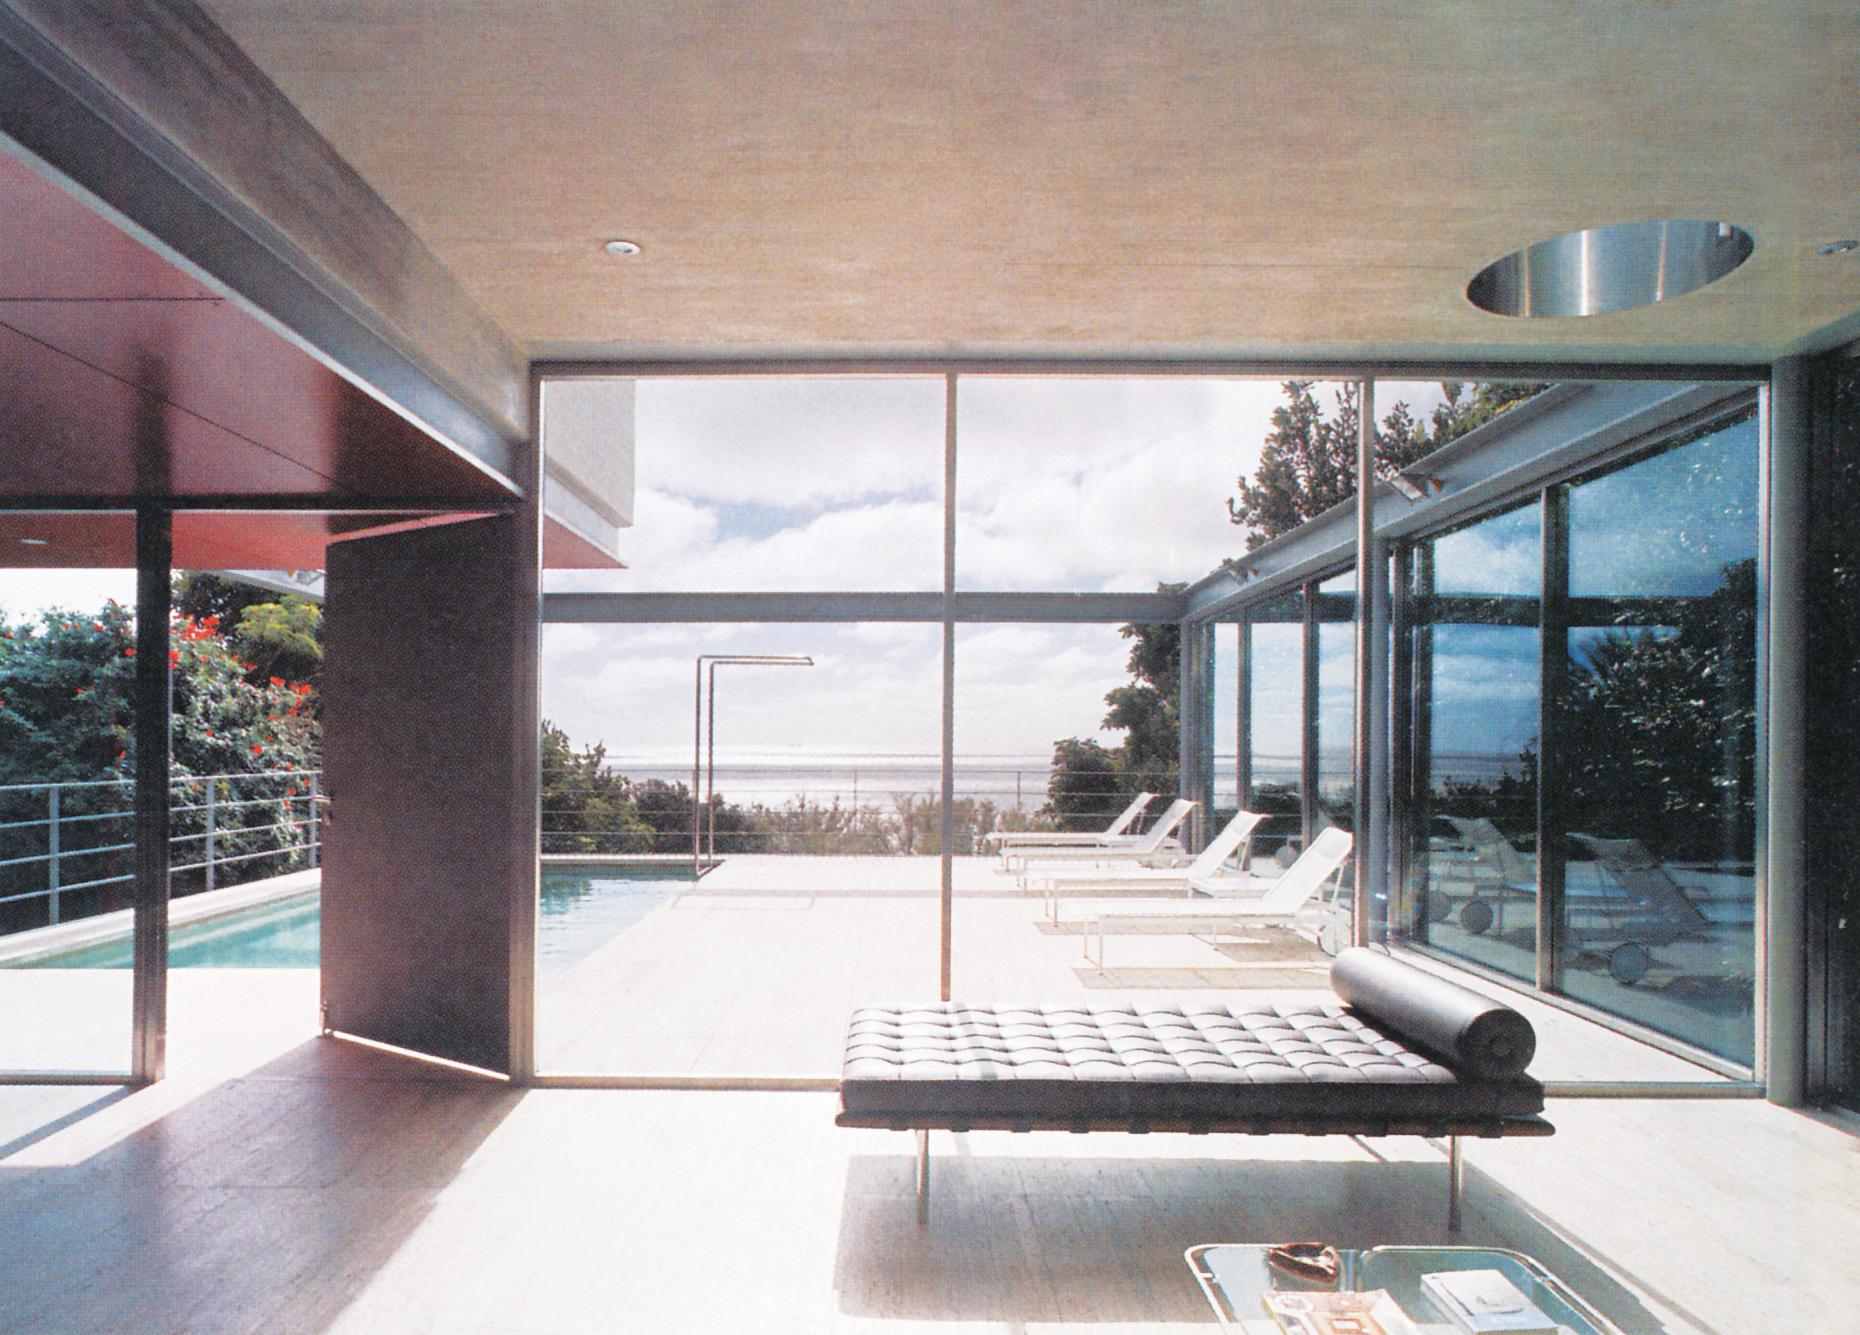 ماتیاس کلوتز، خانهی پونس؛ بوینوس آیرس، برزیل، 2003